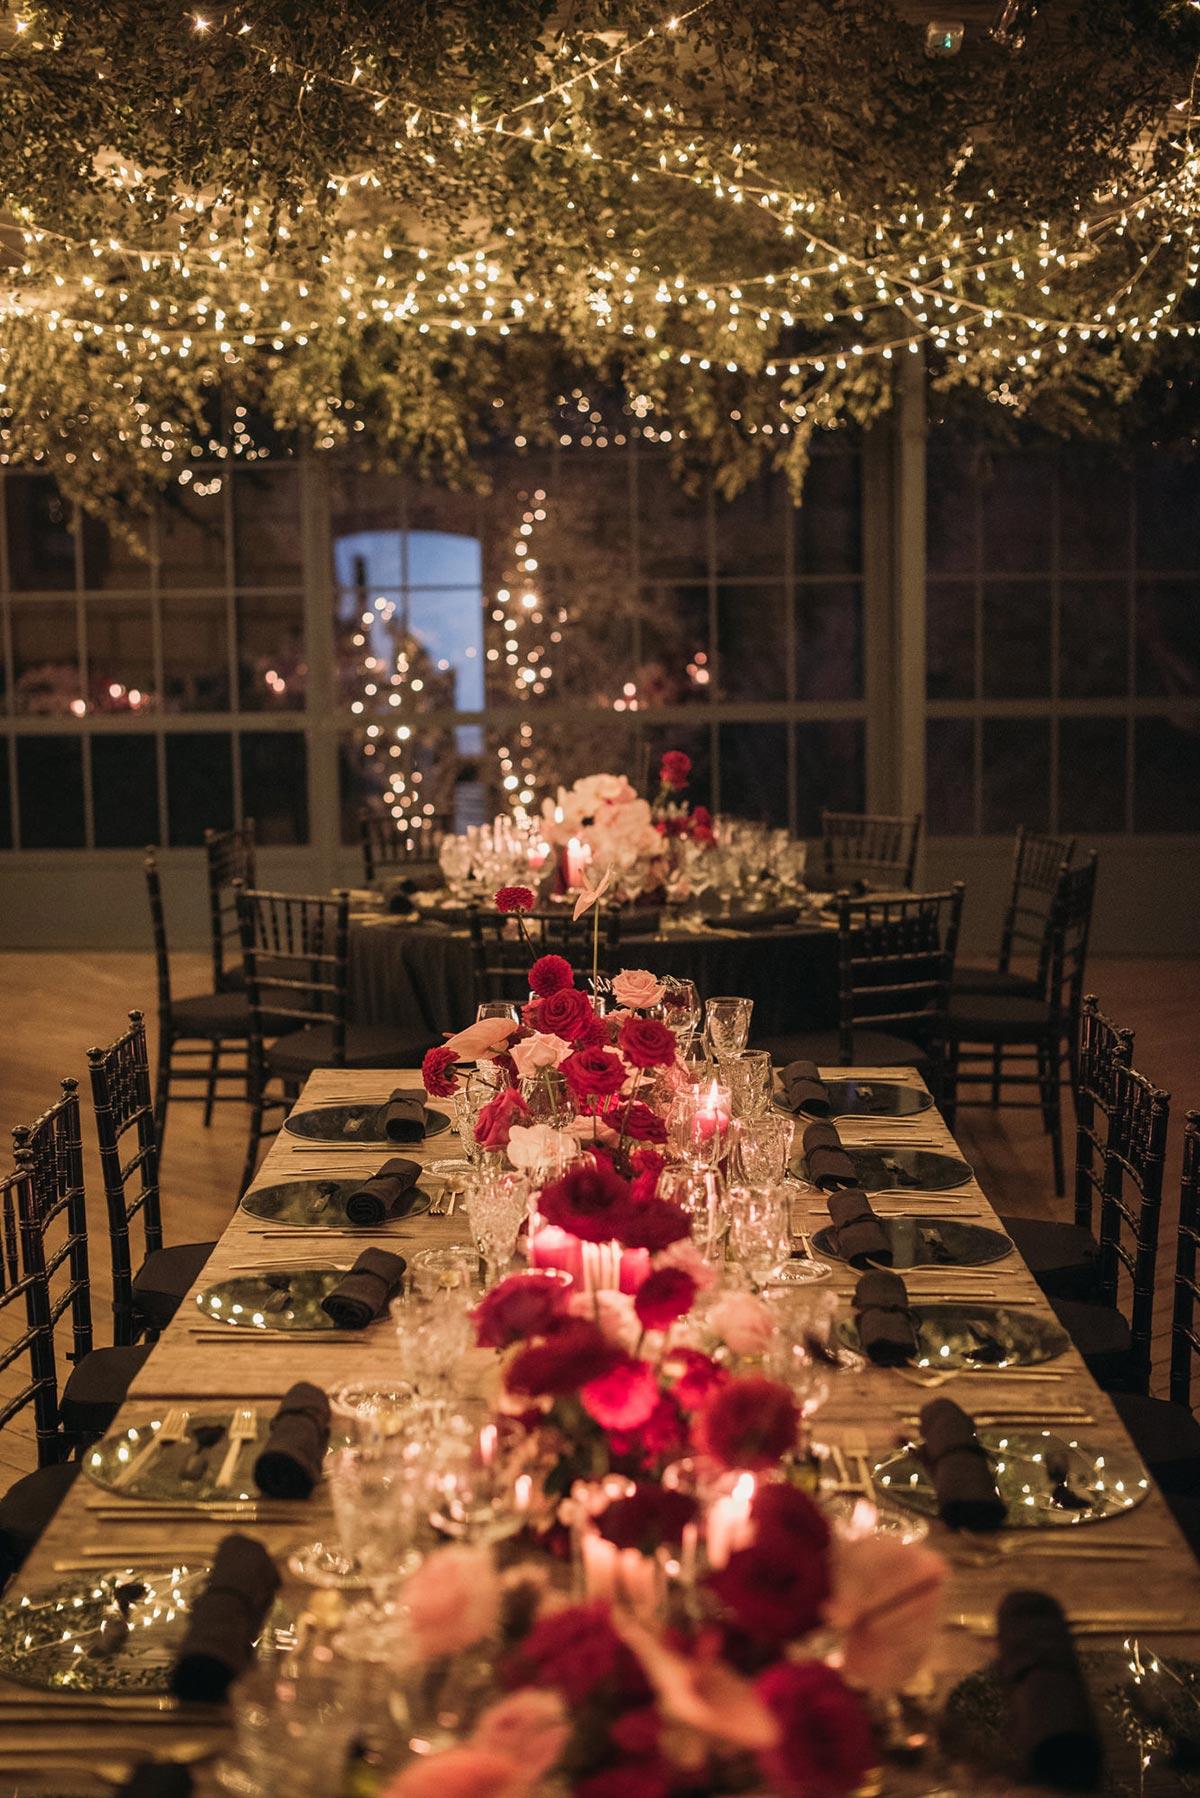 Boda de noche llena de luces | iluminacion mesas | Bodas de Cuento